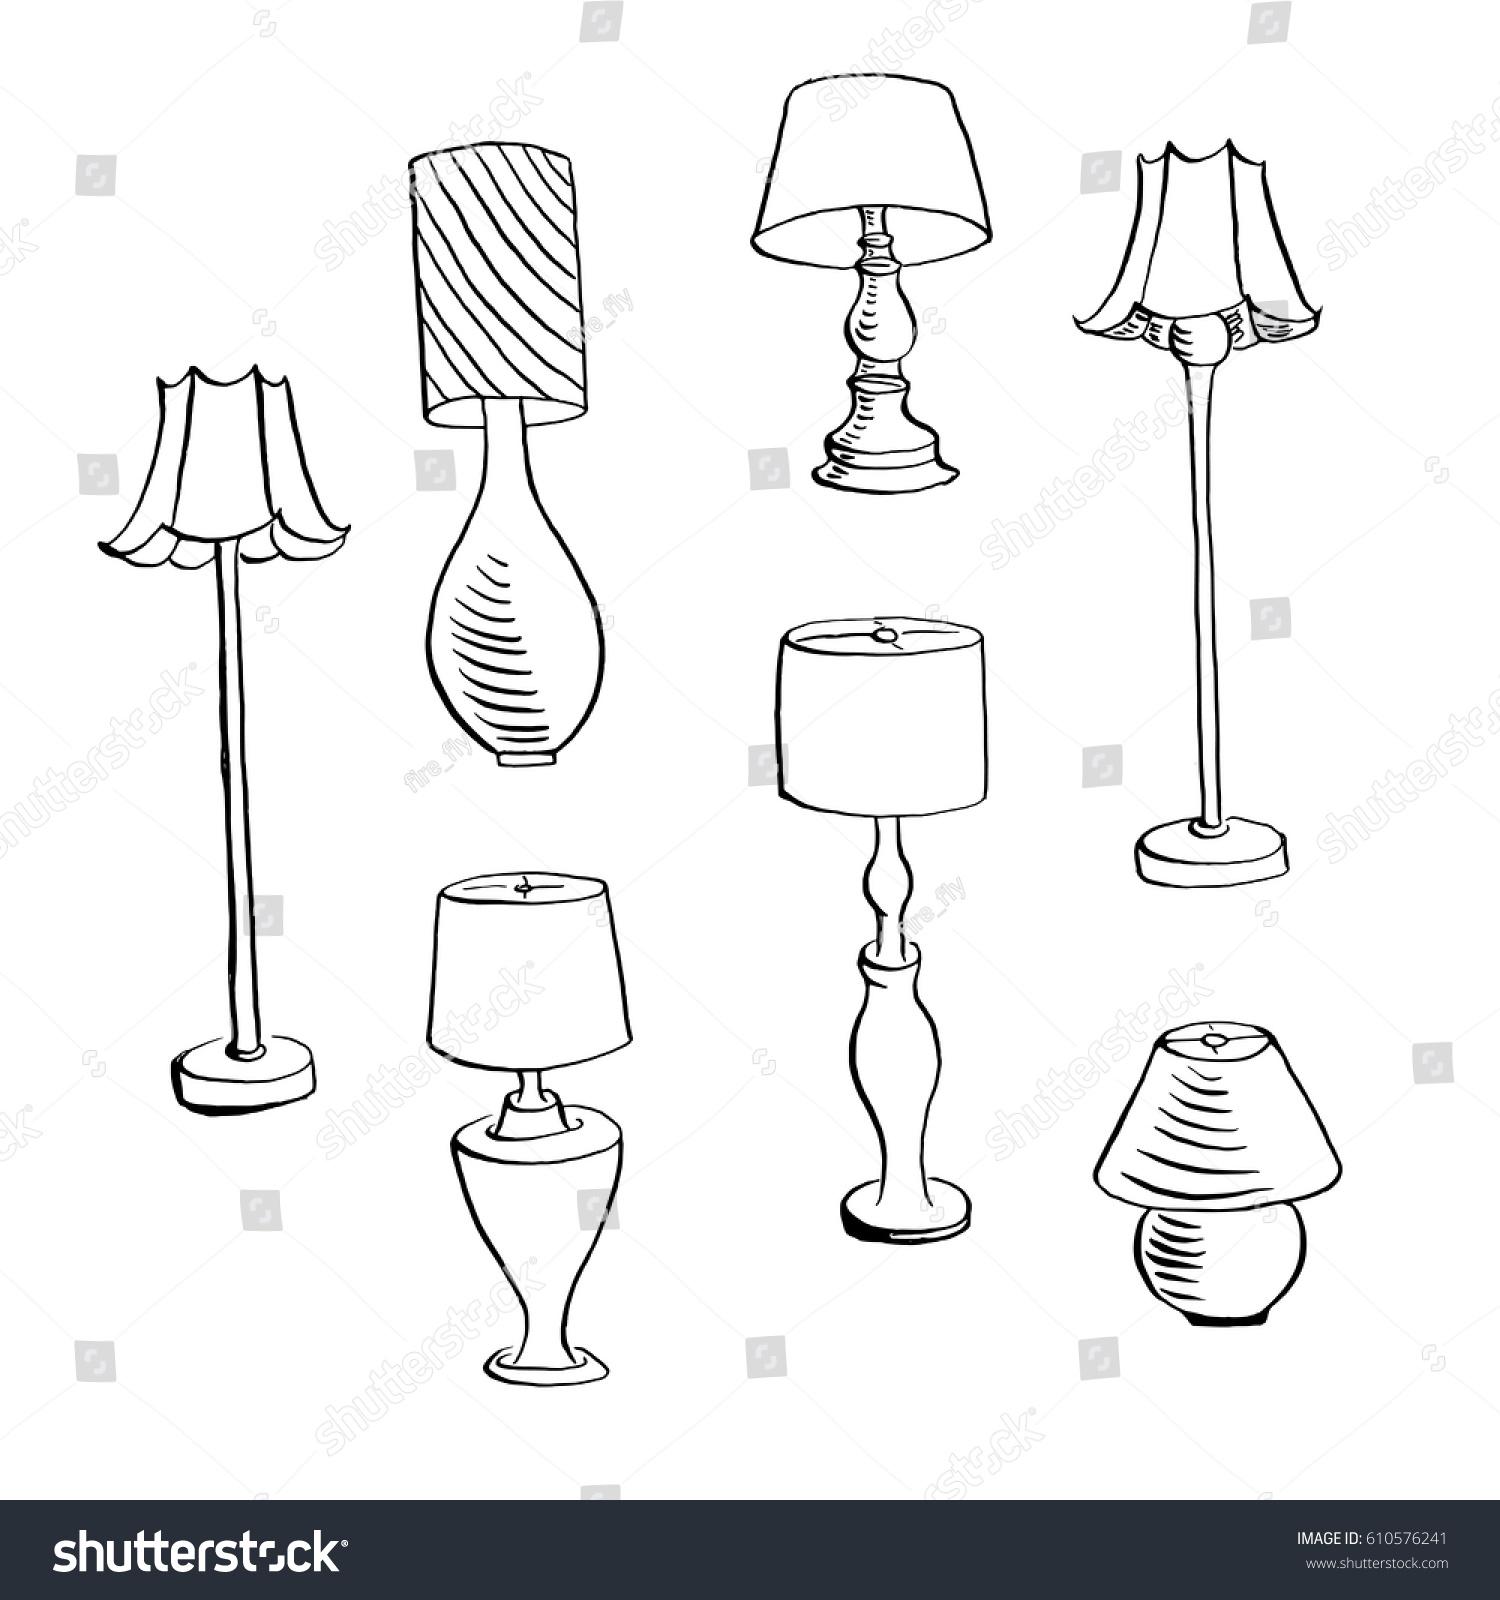 Vintage Lamps Furniture Interior Design Elements Hand Drawn Ink Sketch Illustration Isolated